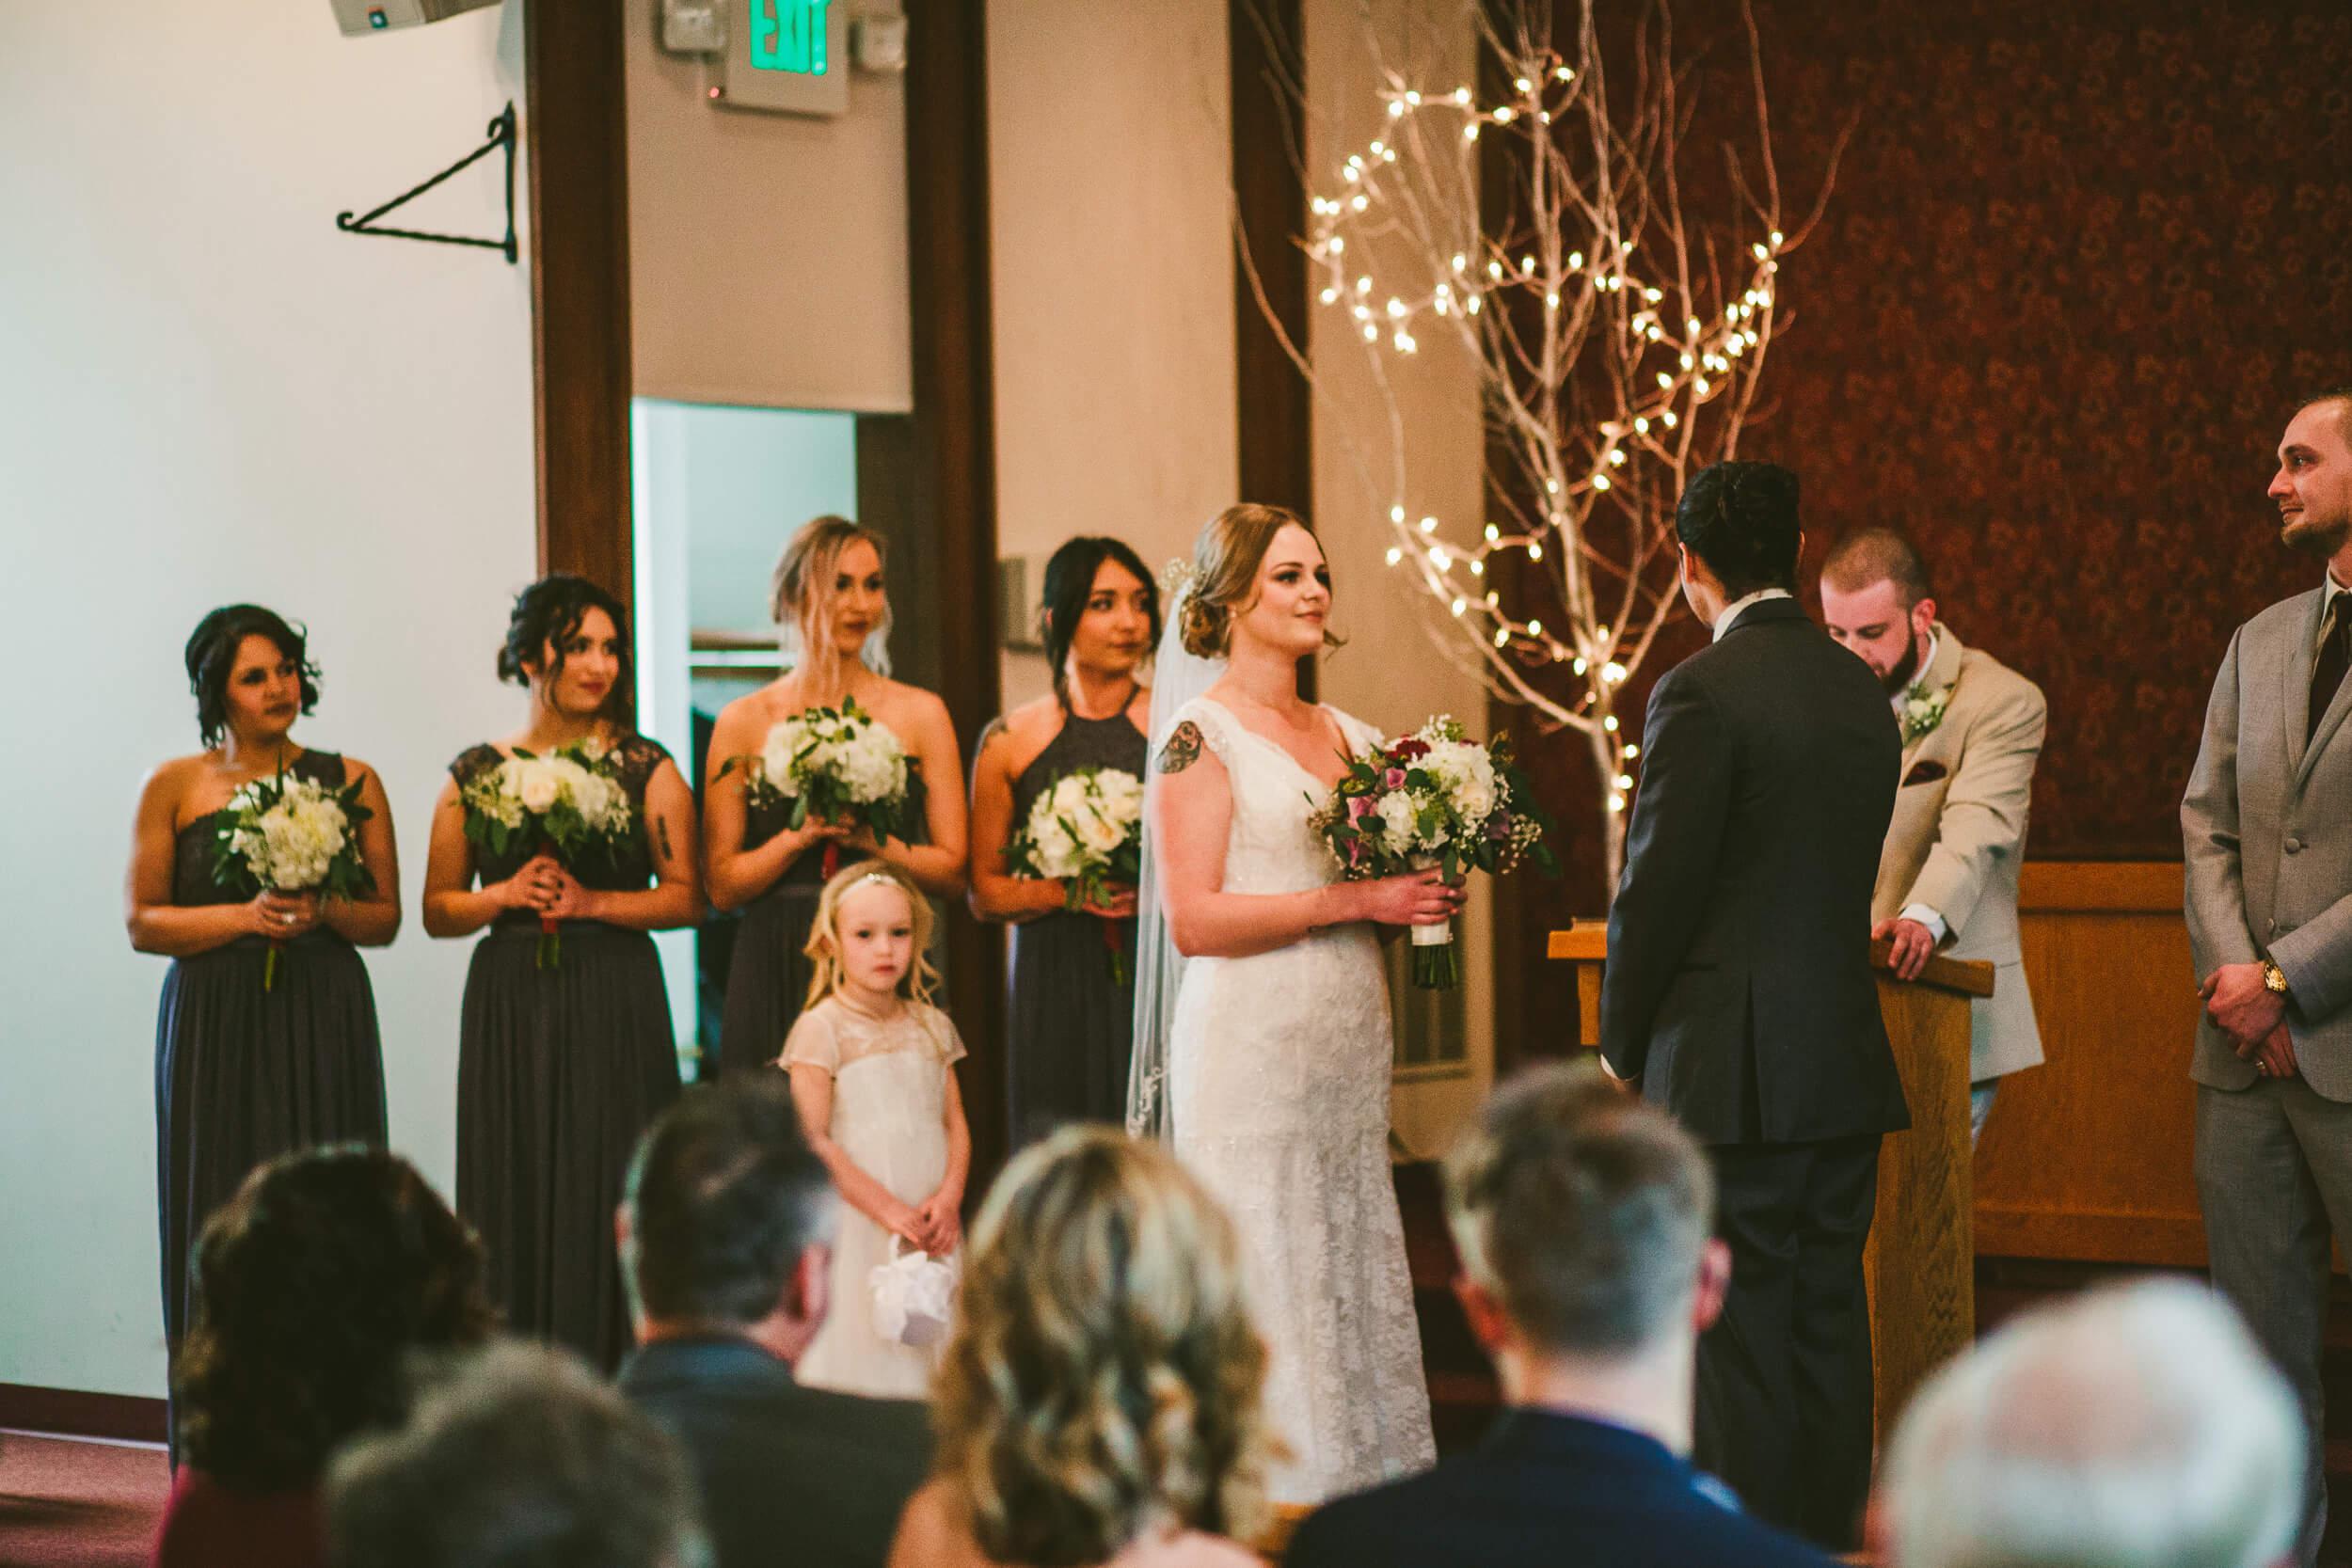 mukogawa winter wedding in spokane (159).jpg